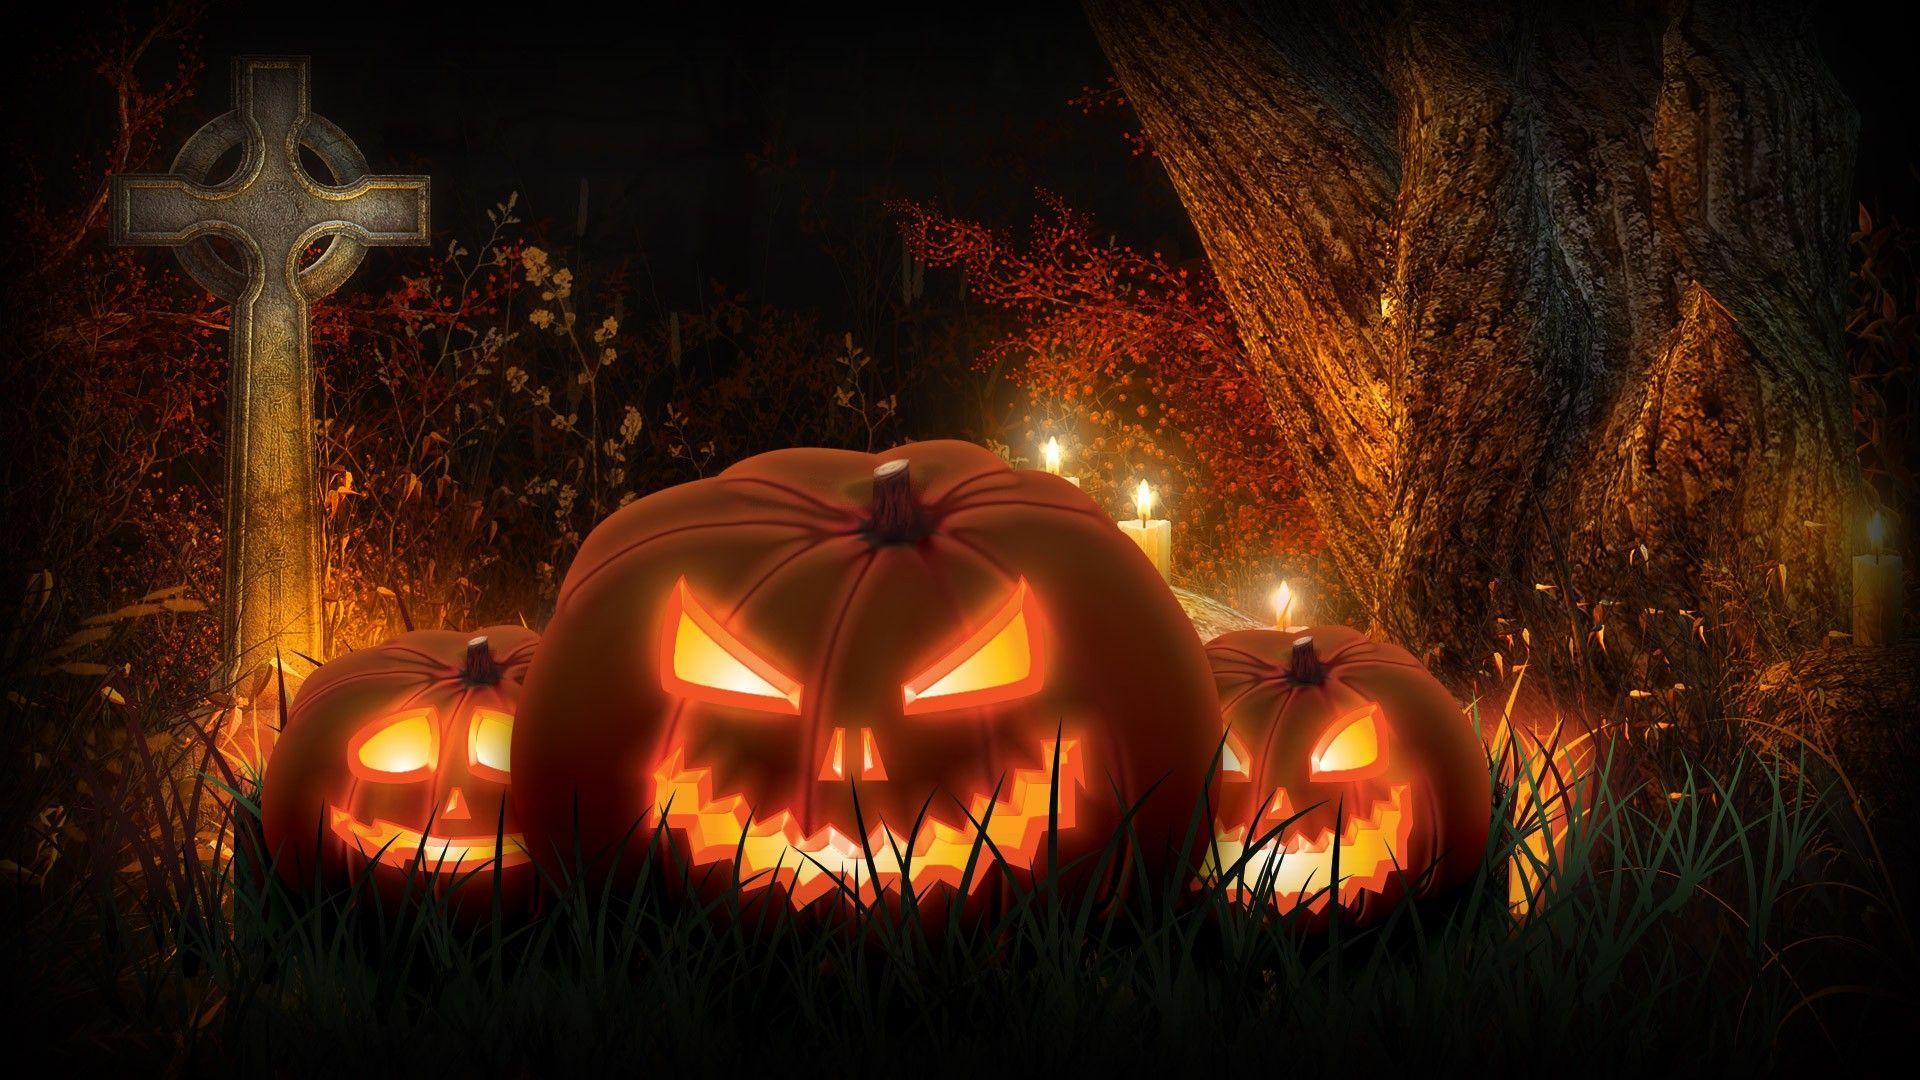 Hello October With Pumpkin Wallpapers Top Free Hello October With Pumpkin Backgrounds Wallpaperaccess